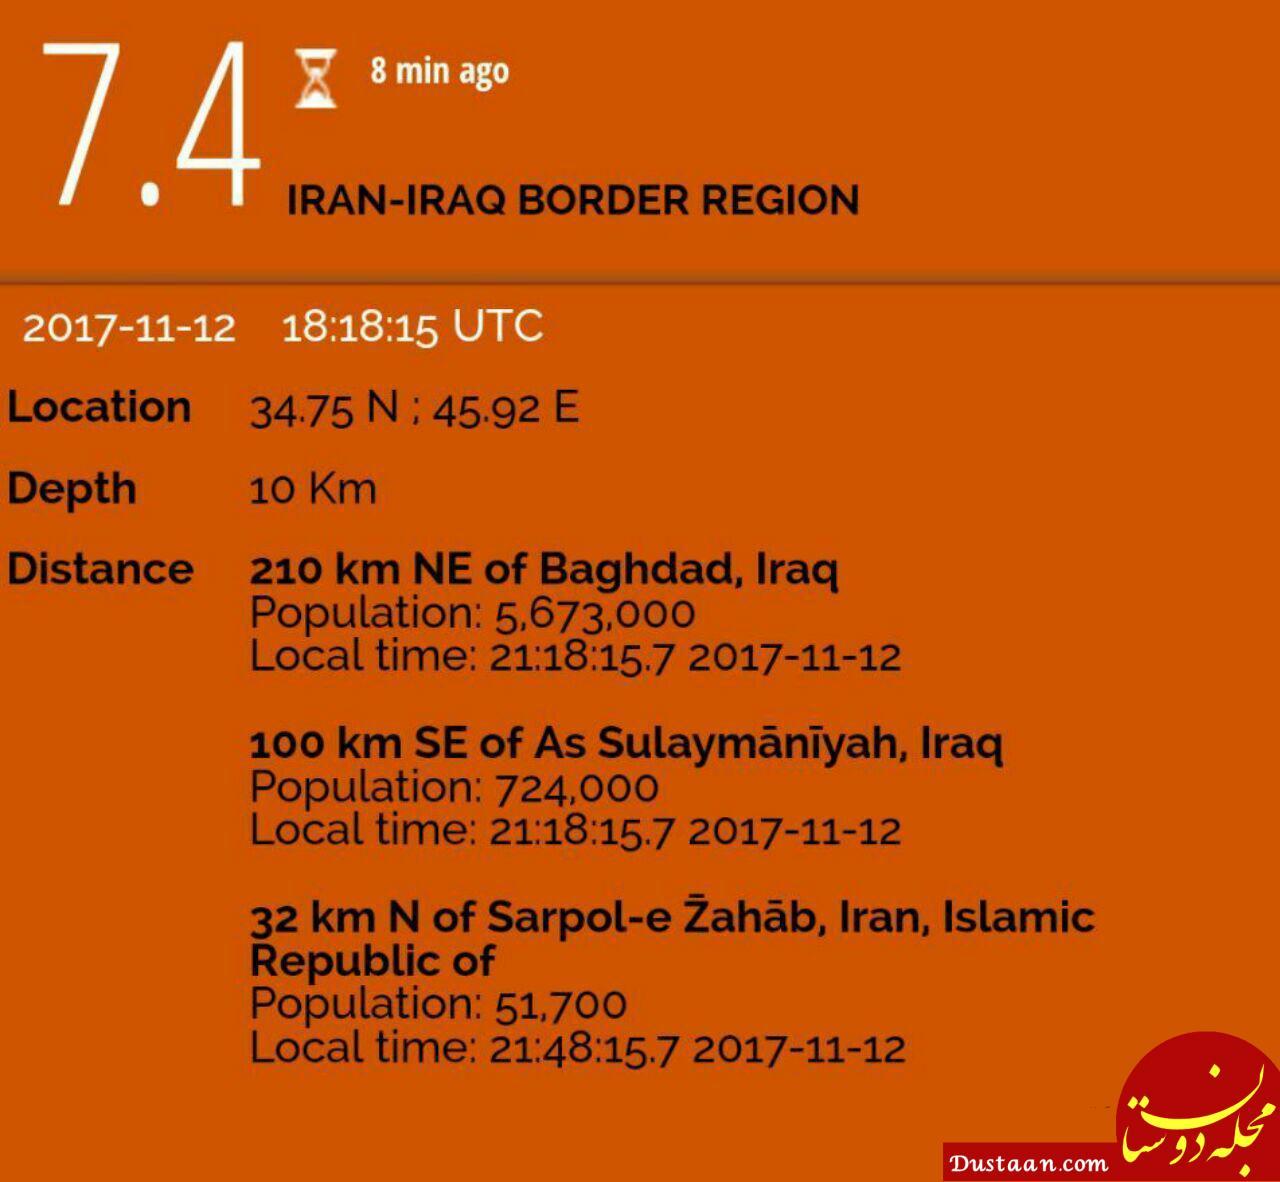 www.dustaan.com جزئیات وقوع زلزله در بناب و آذربایجان شرقی و کربلا +فیلم